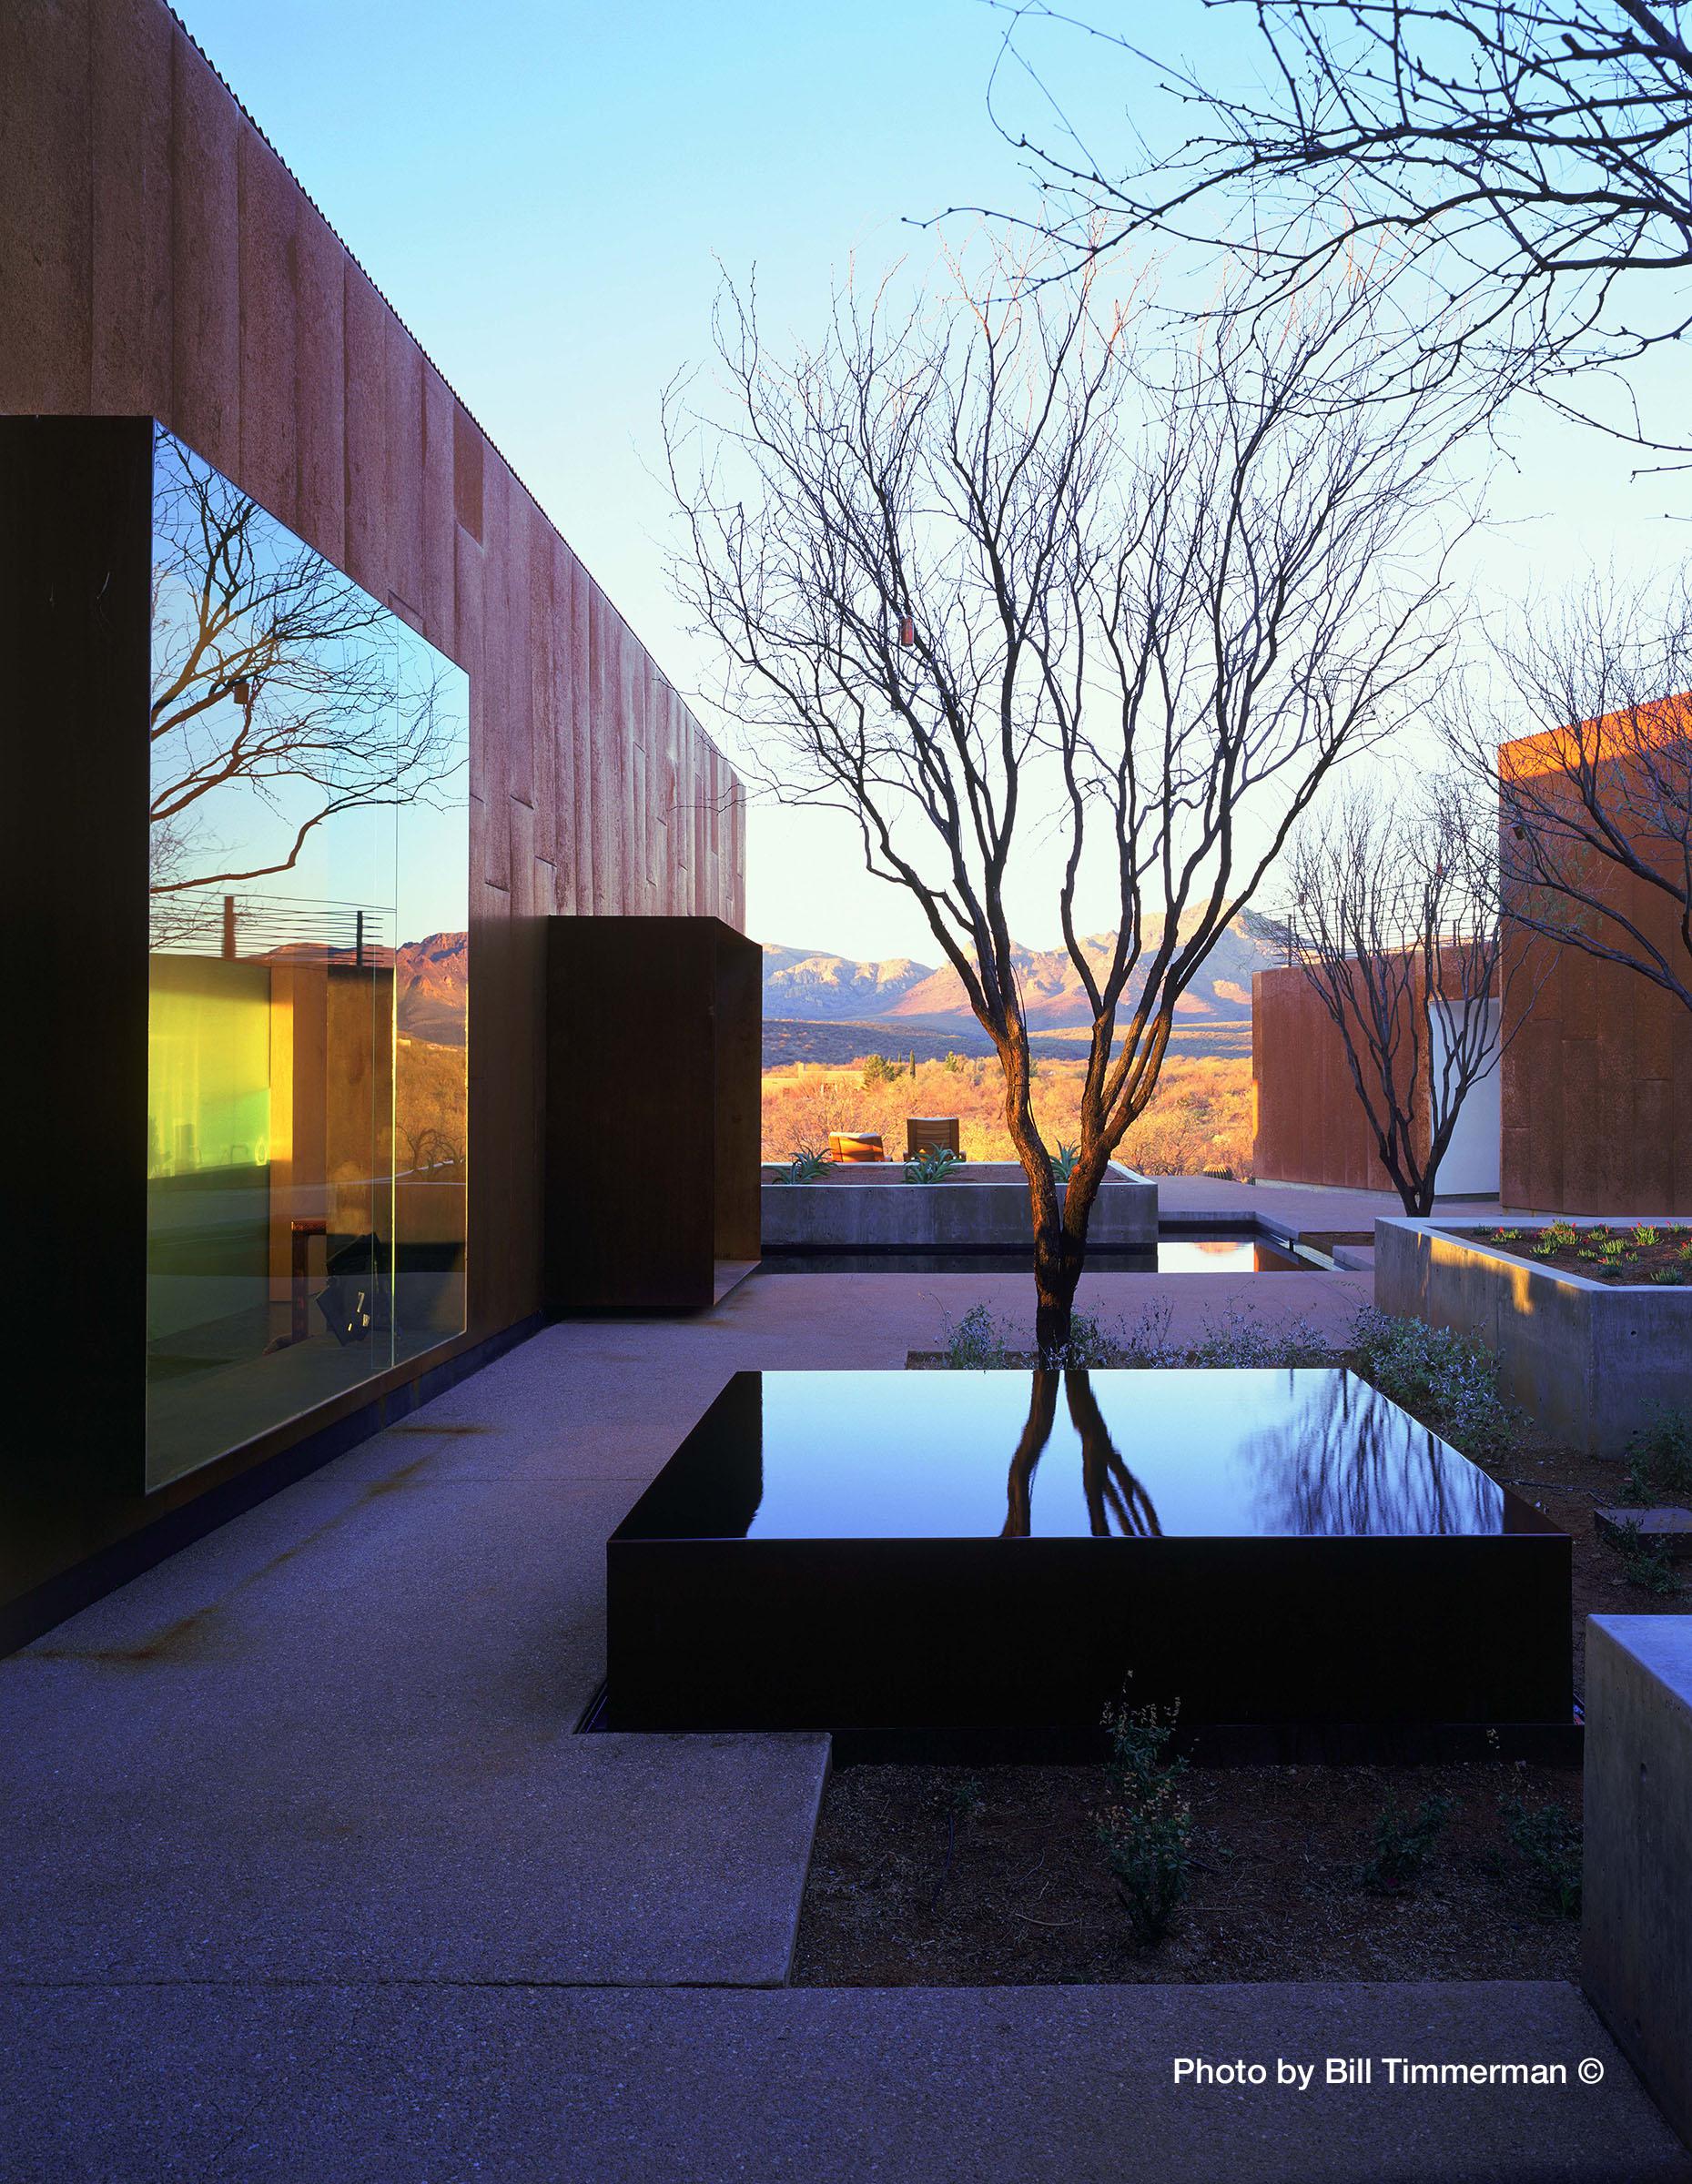 RJA_Timmerman_Tubac Courtyard.4.jpg